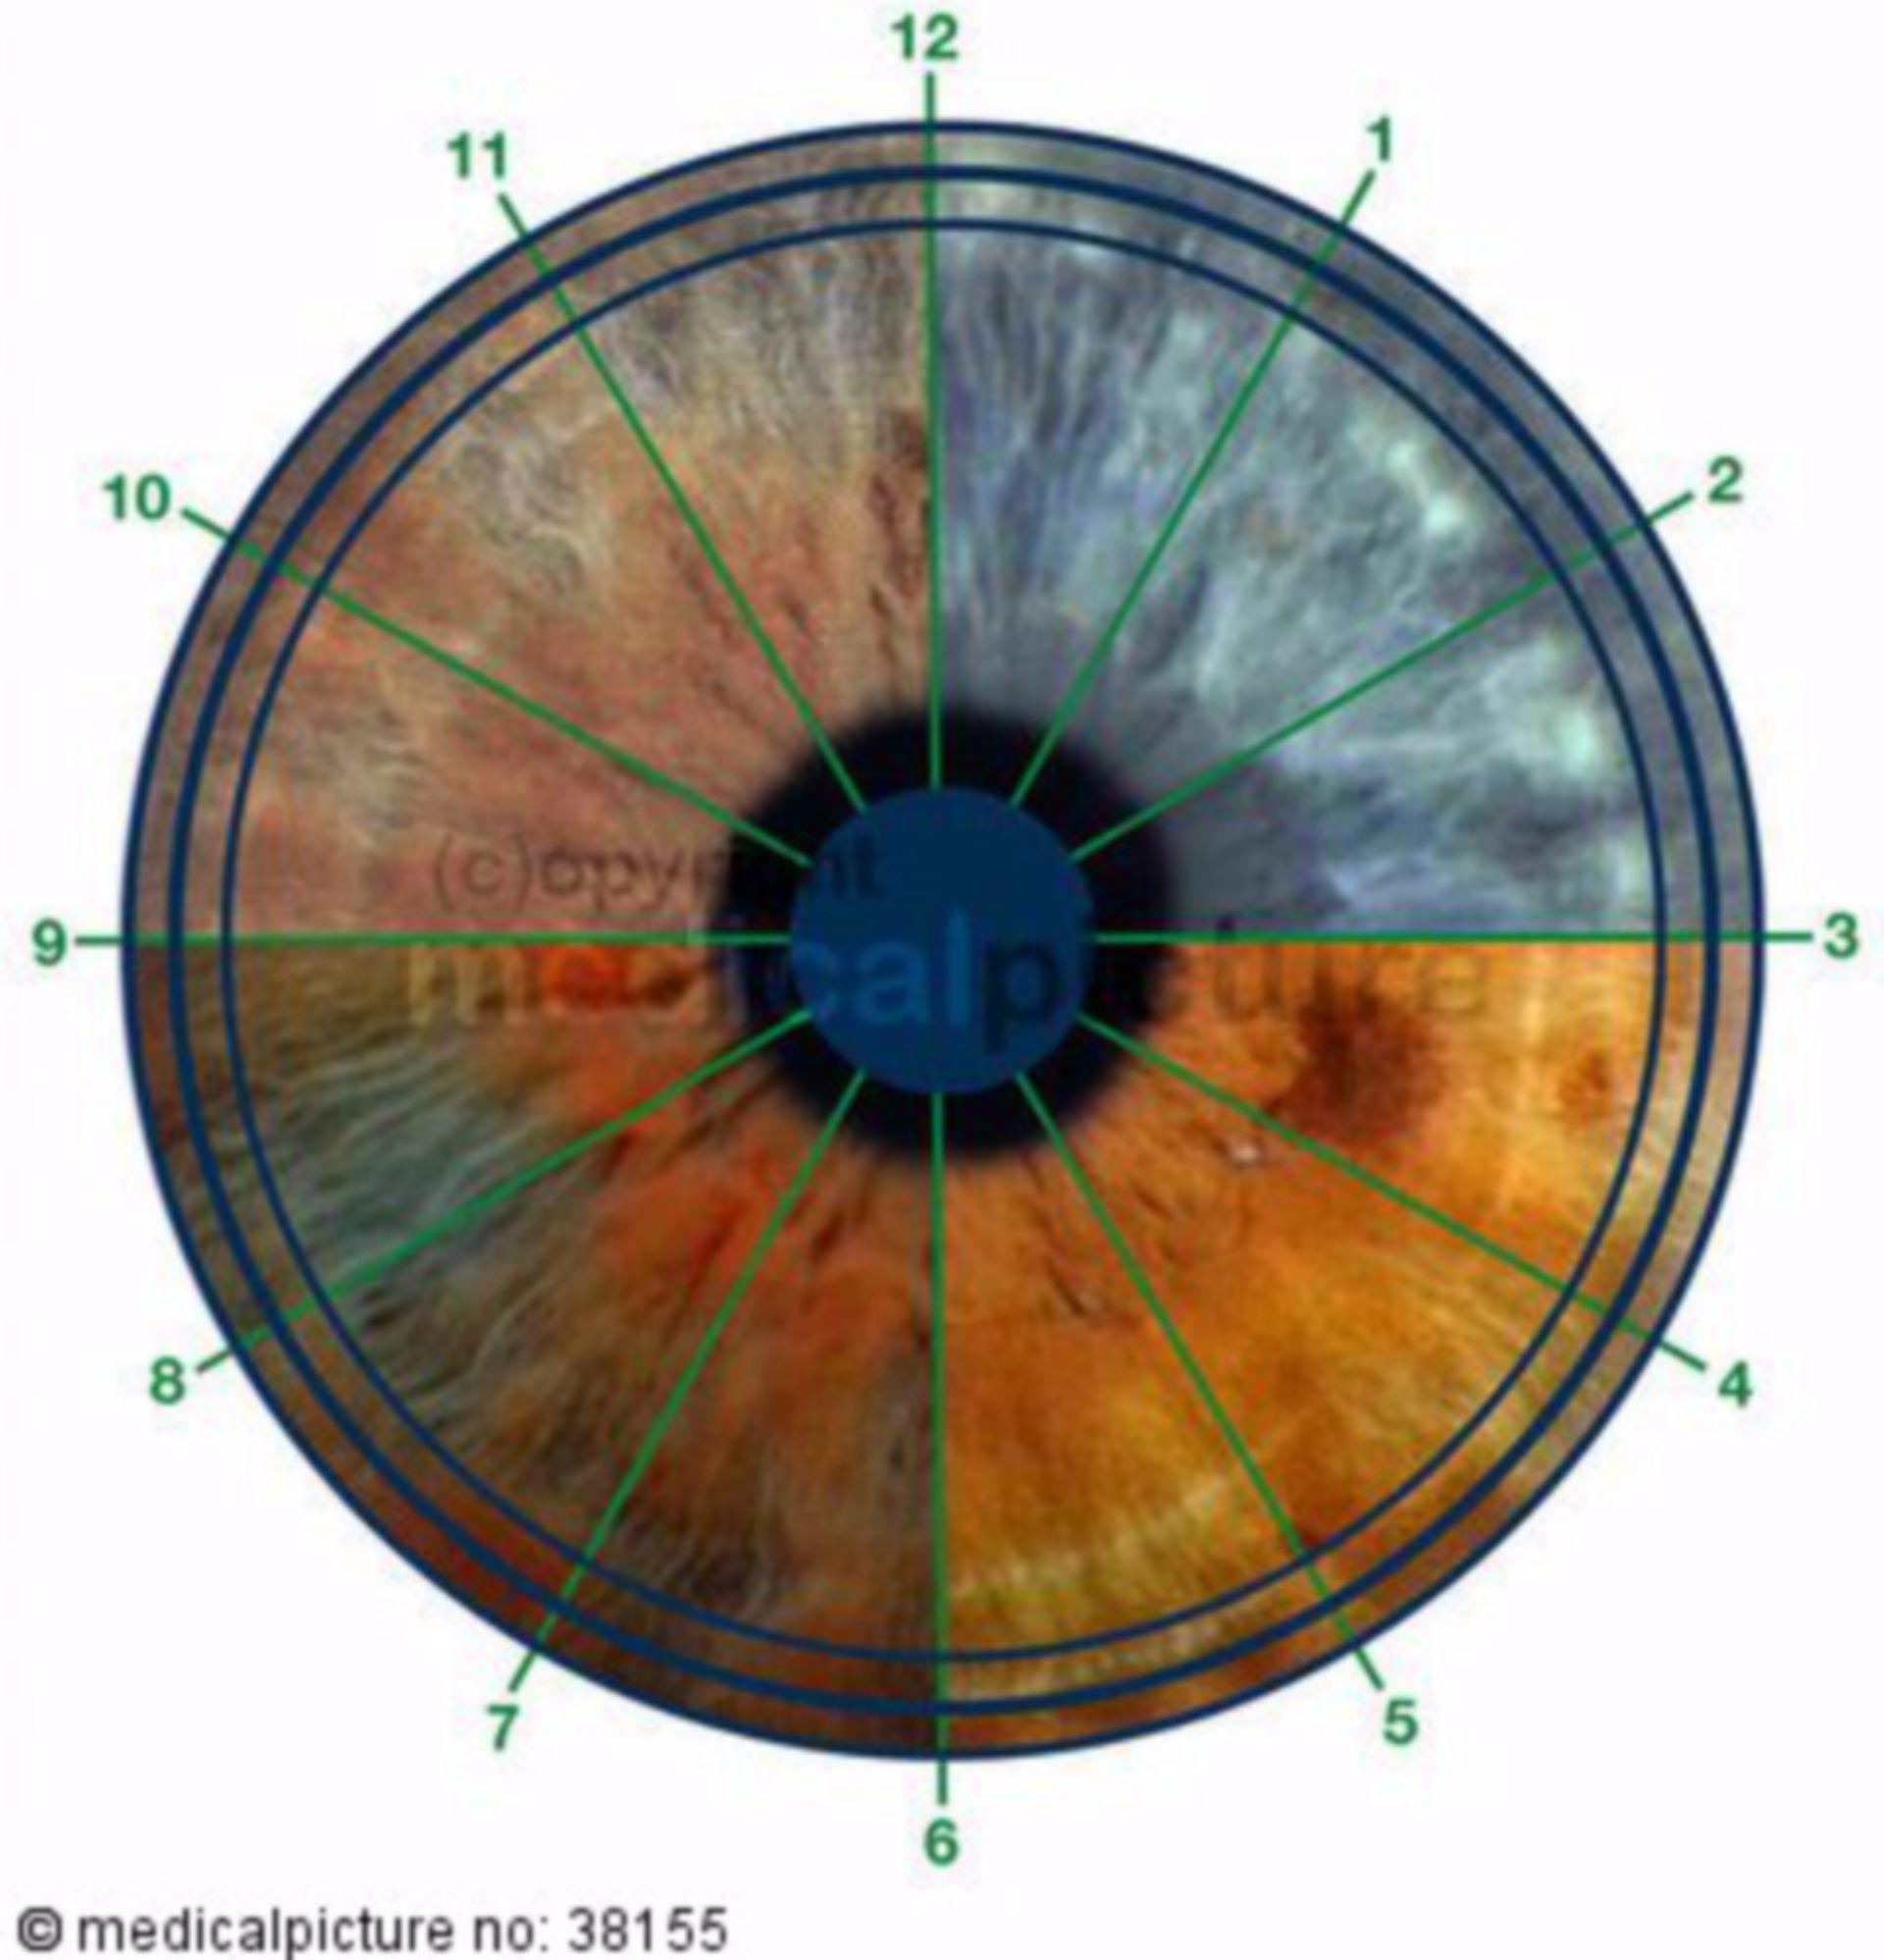 Irisdiagnostik, iris diagnostics